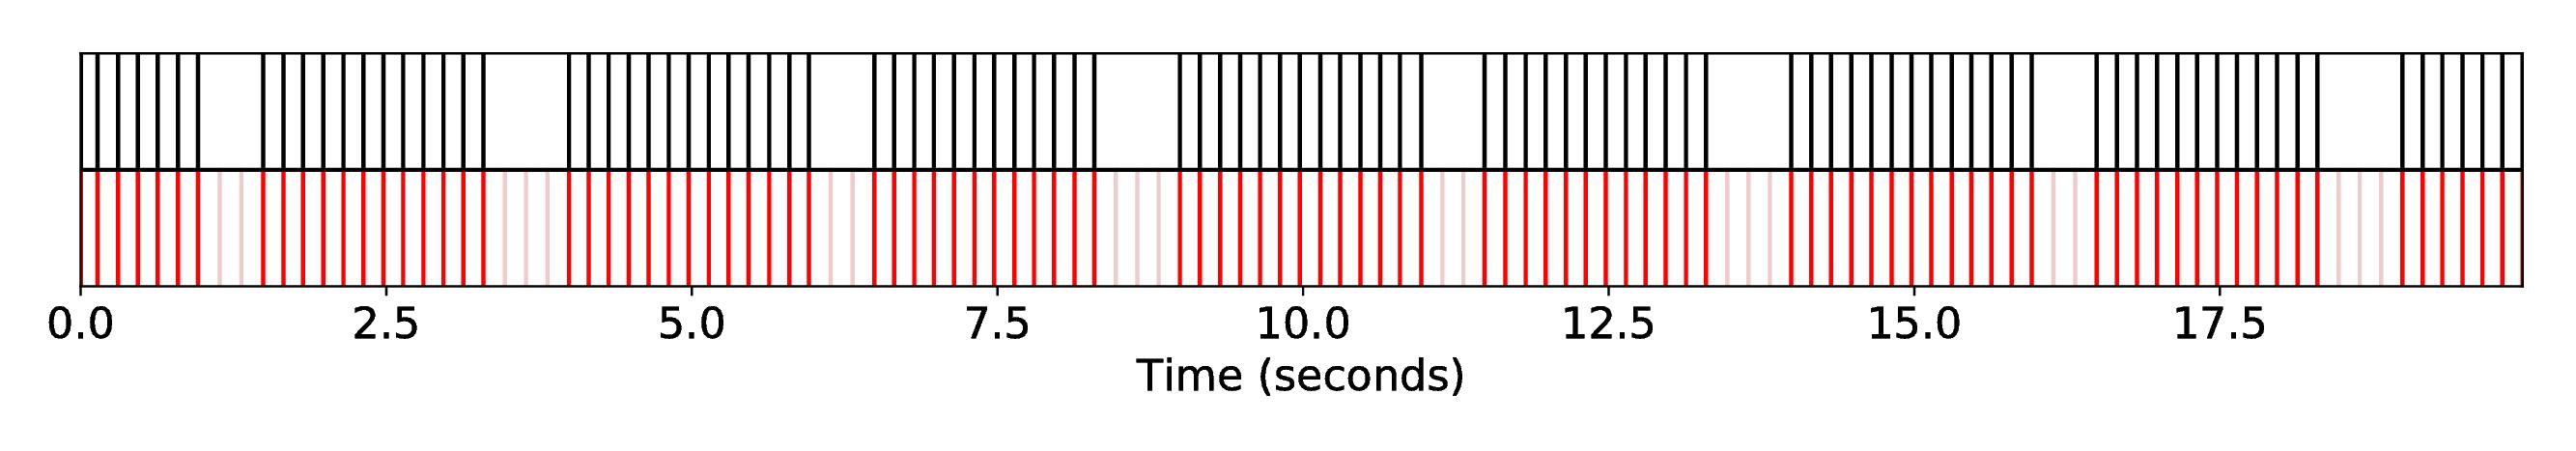 DP1_INT1_R-MRI-24__S-Fandango__SequenceAlignment